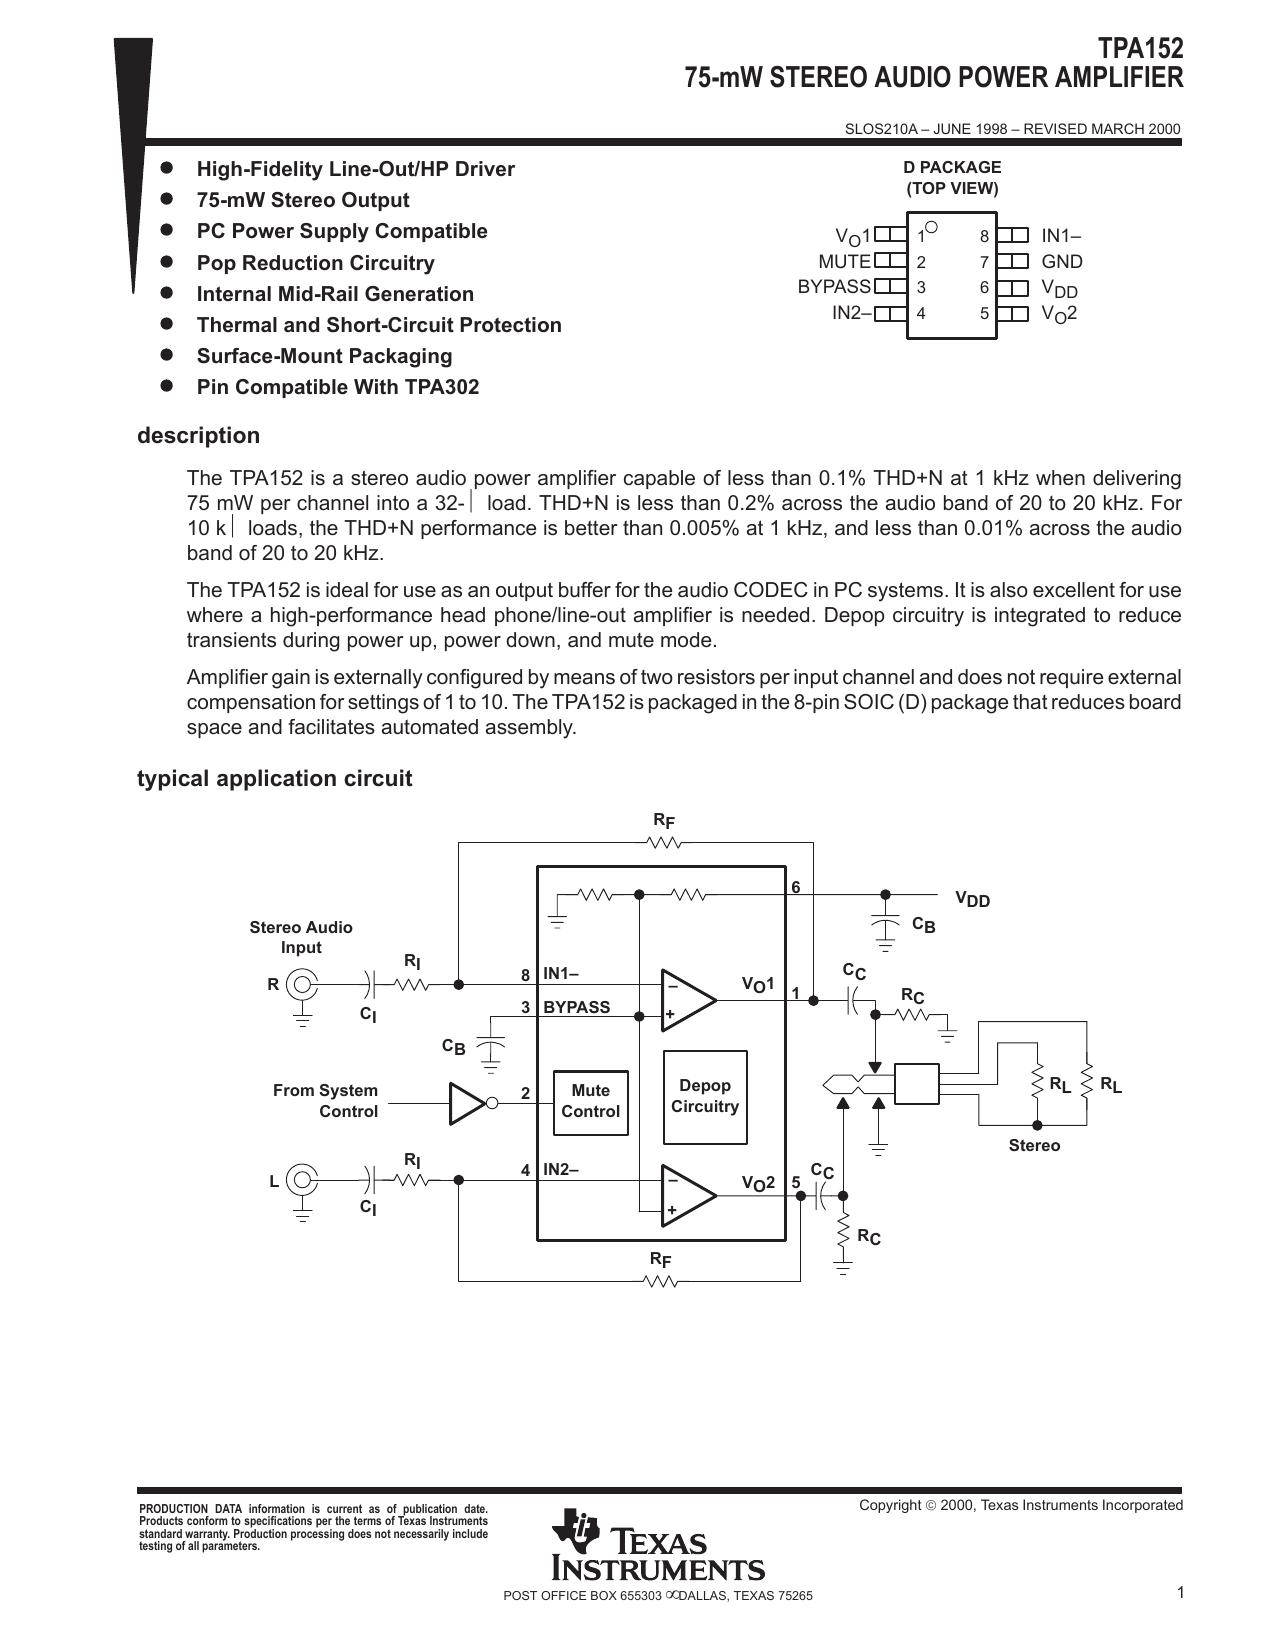 1X TPA152  75-mW STEREO AUDIO POWER AMPLIFIER